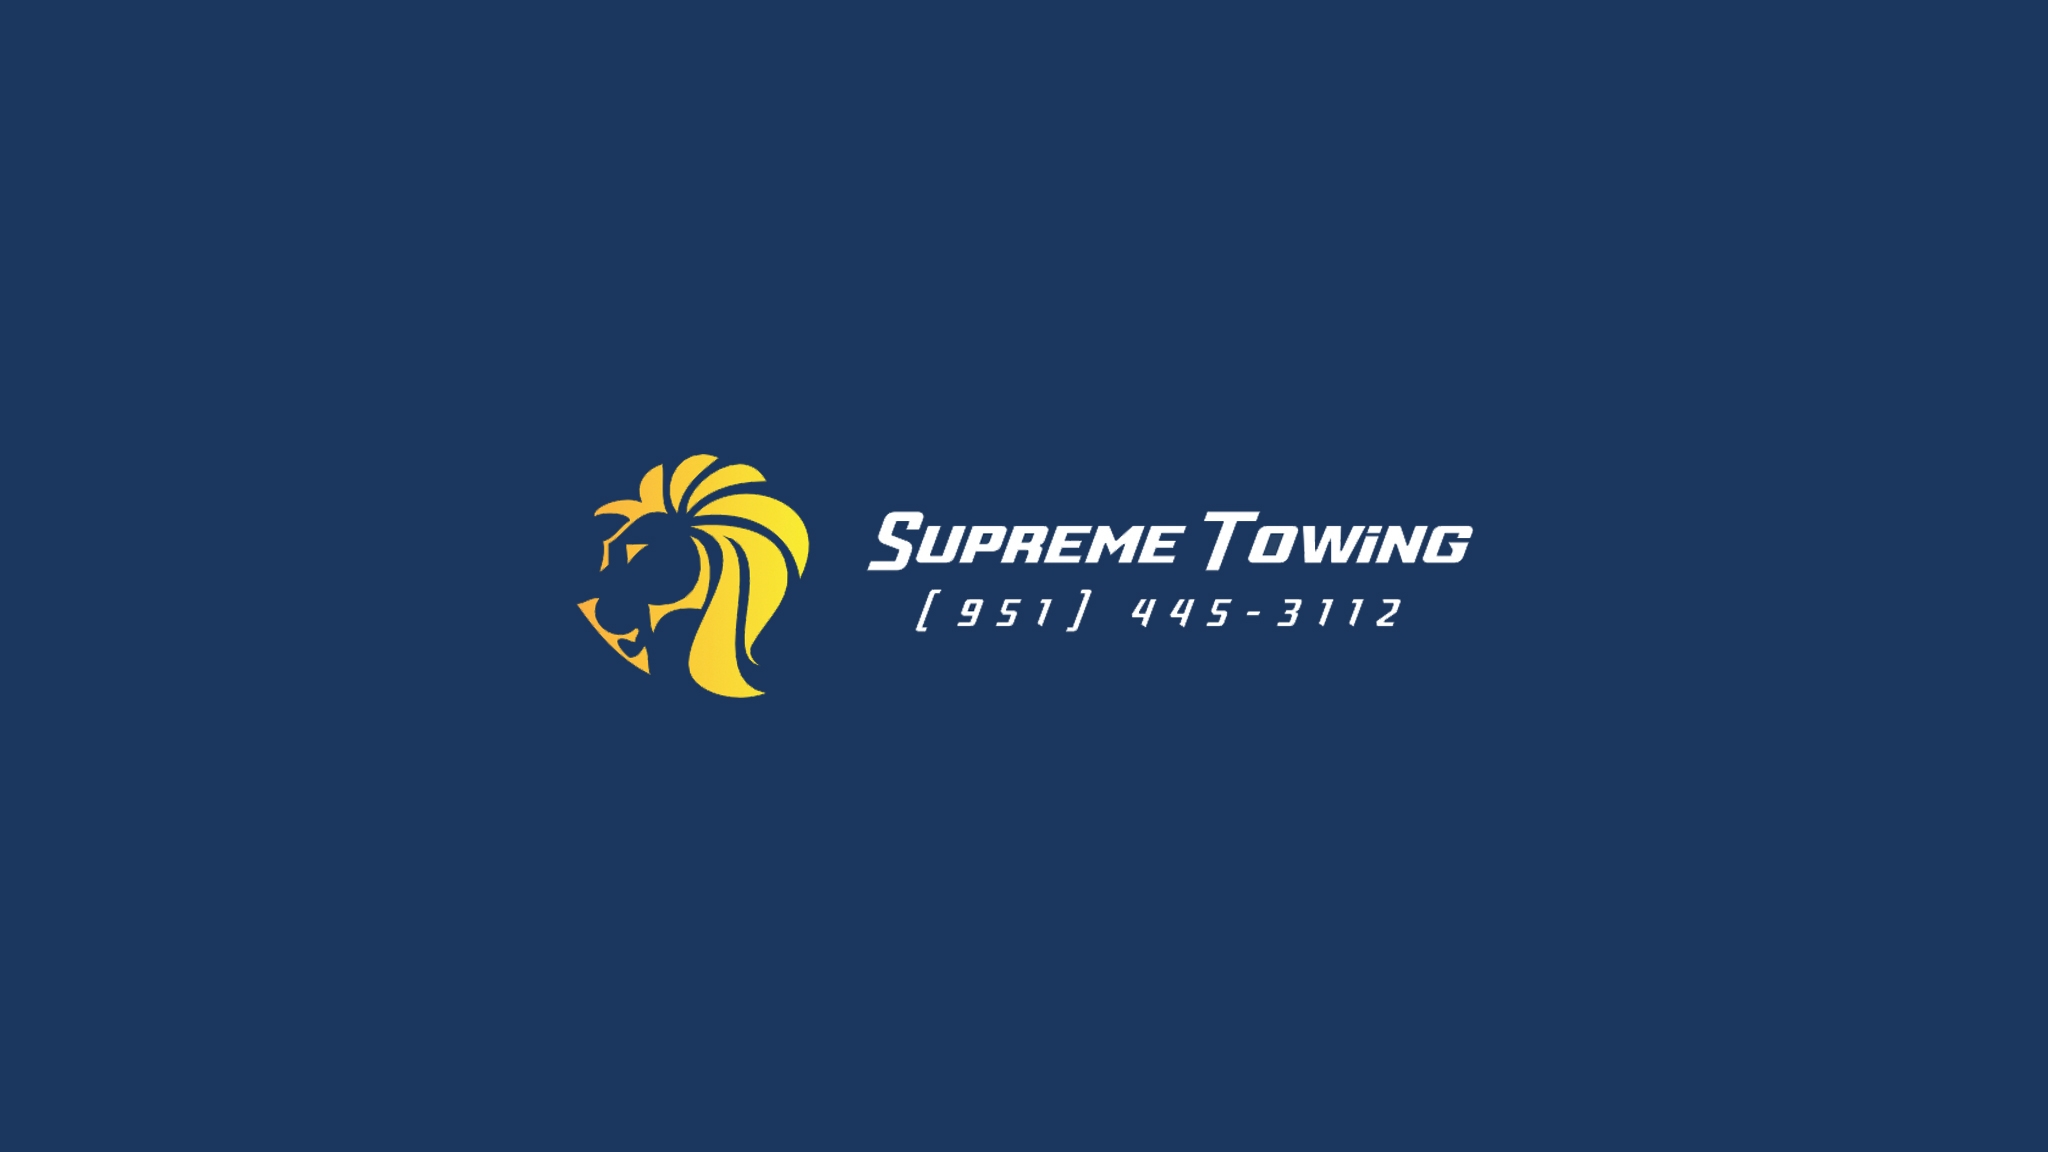 Supreme Towing Inc (@supremetowinginc) Cover Image